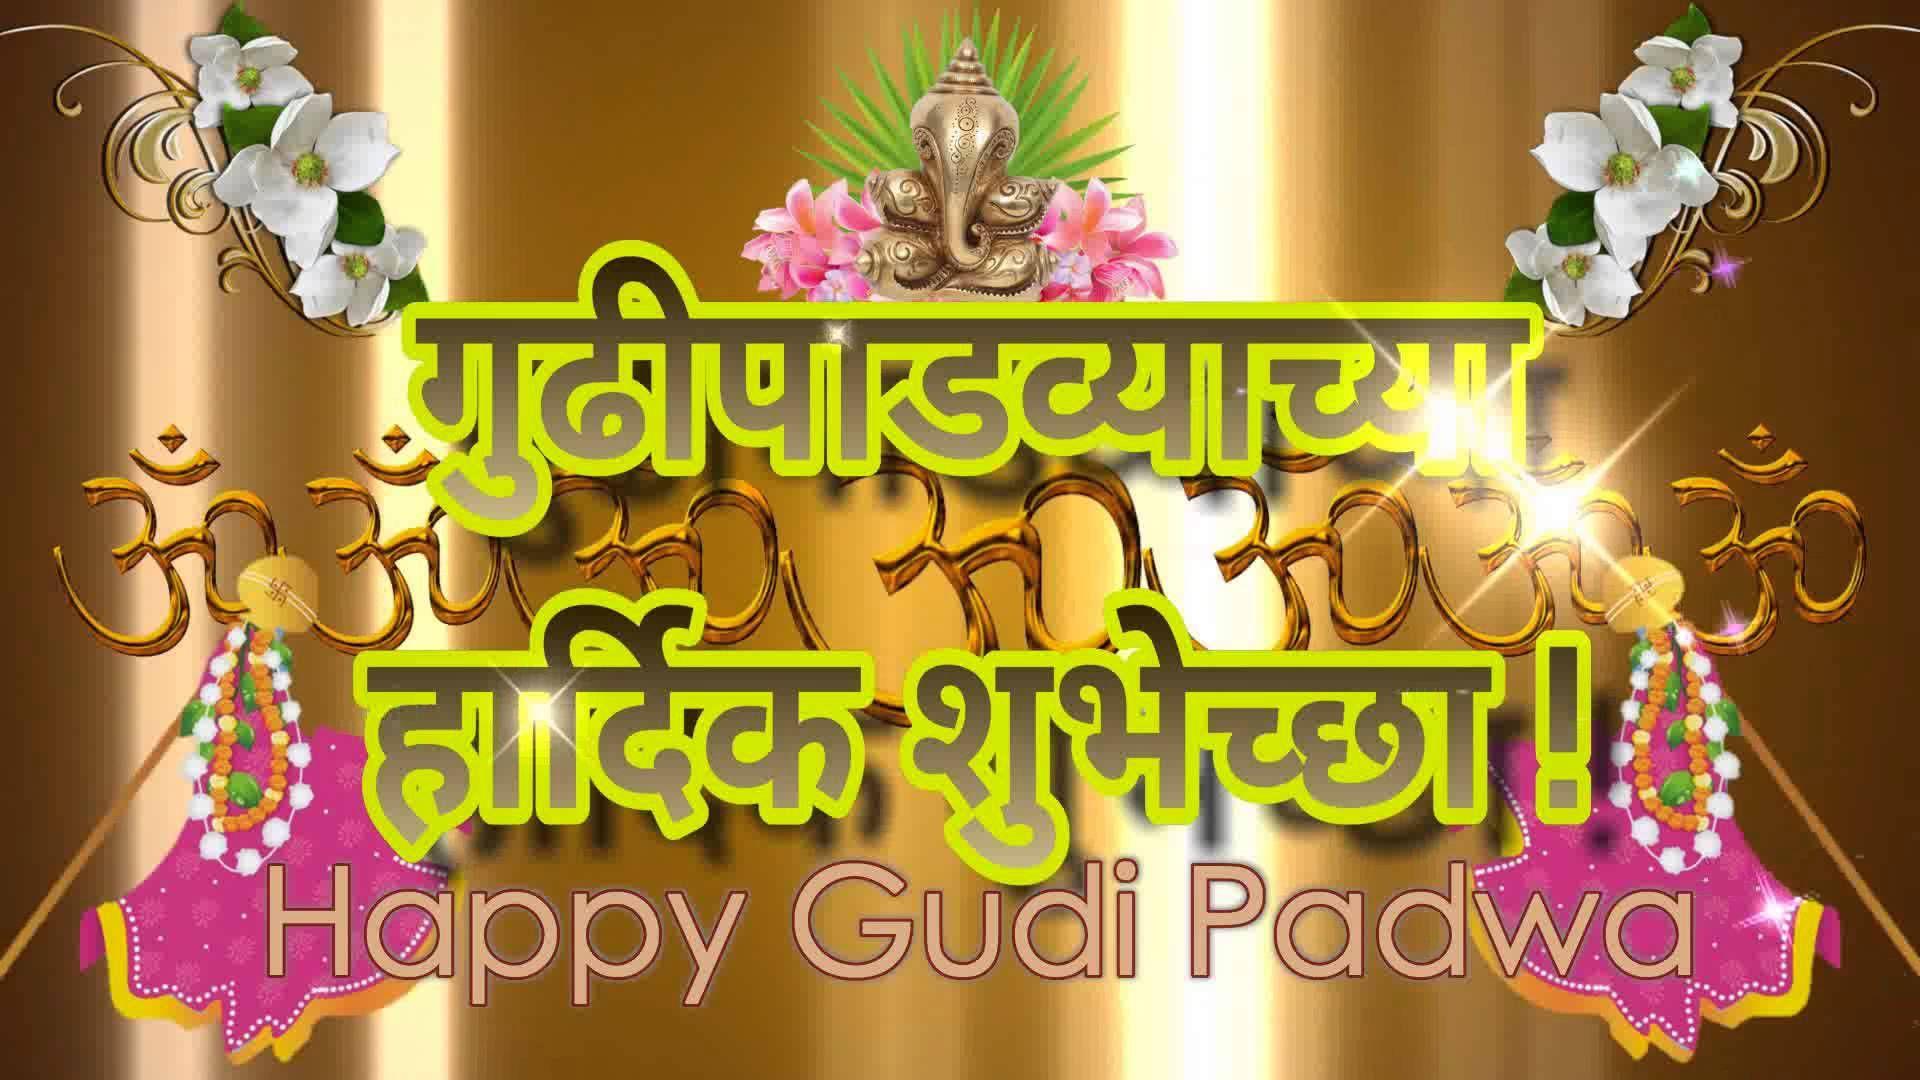 Happy Gudi Padwa Gudi Padwa Animation Gudi Padwa Greetings Gudi